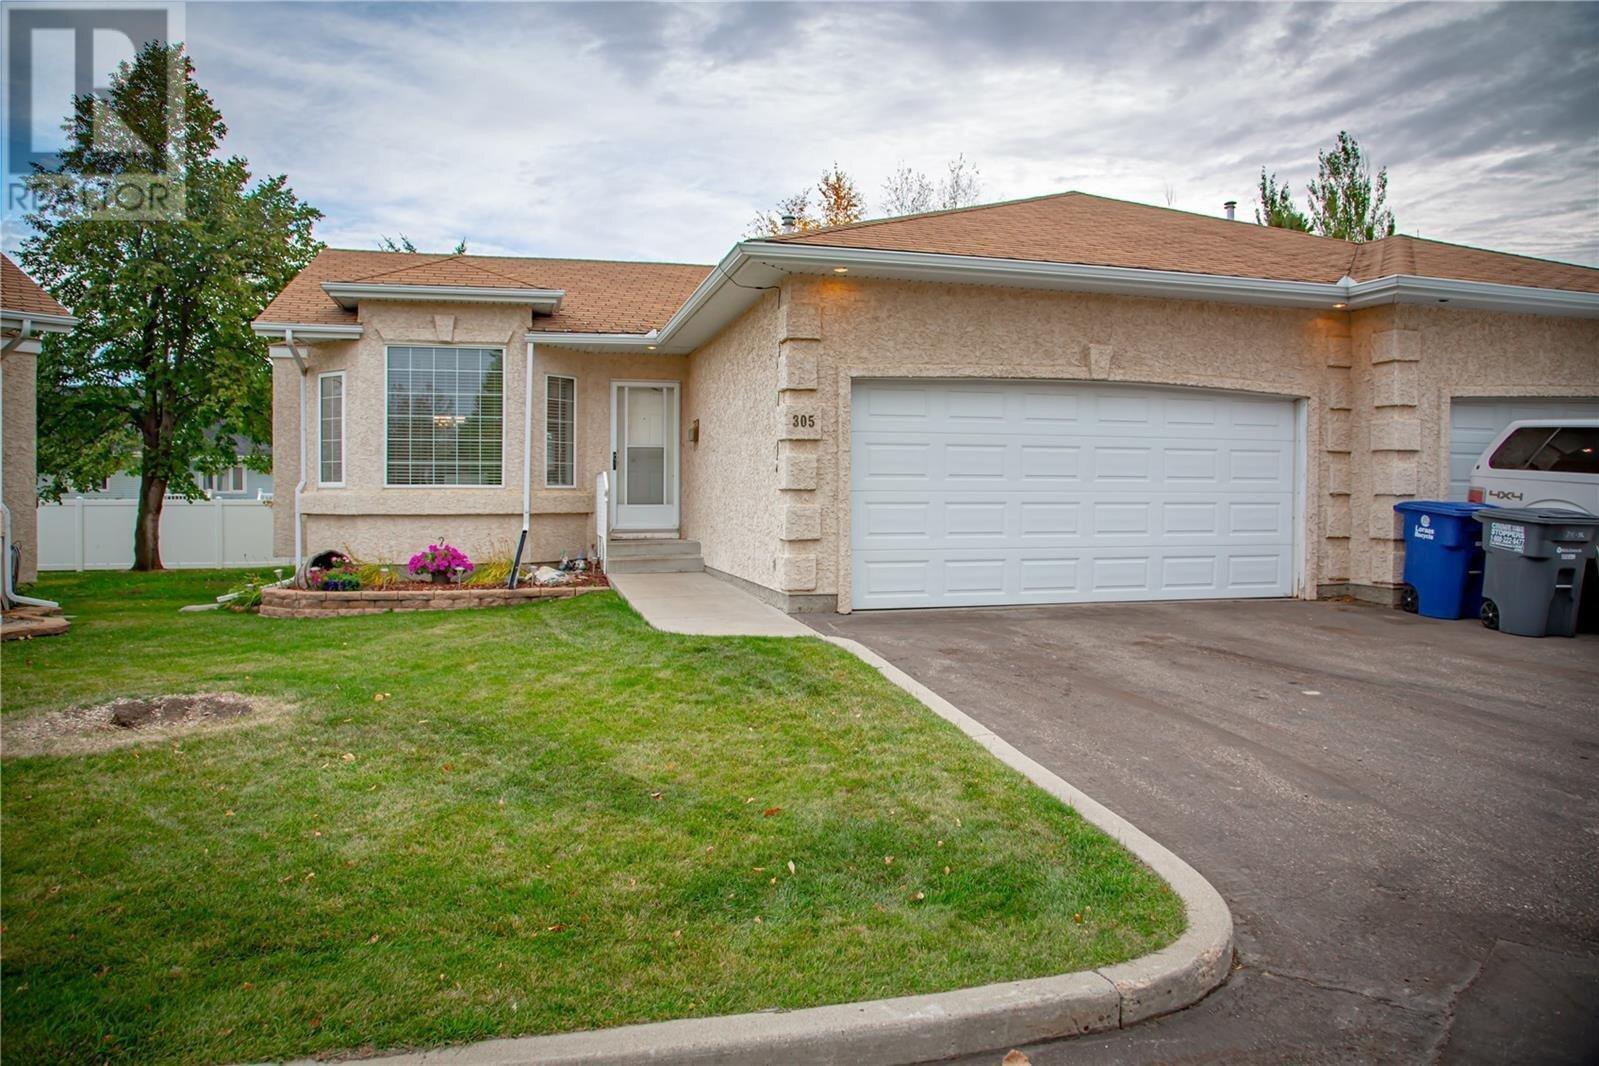 House for sale at 315 Berini Dr Unit 305 Saskatoon Saskatchewan - MLS: SK831746